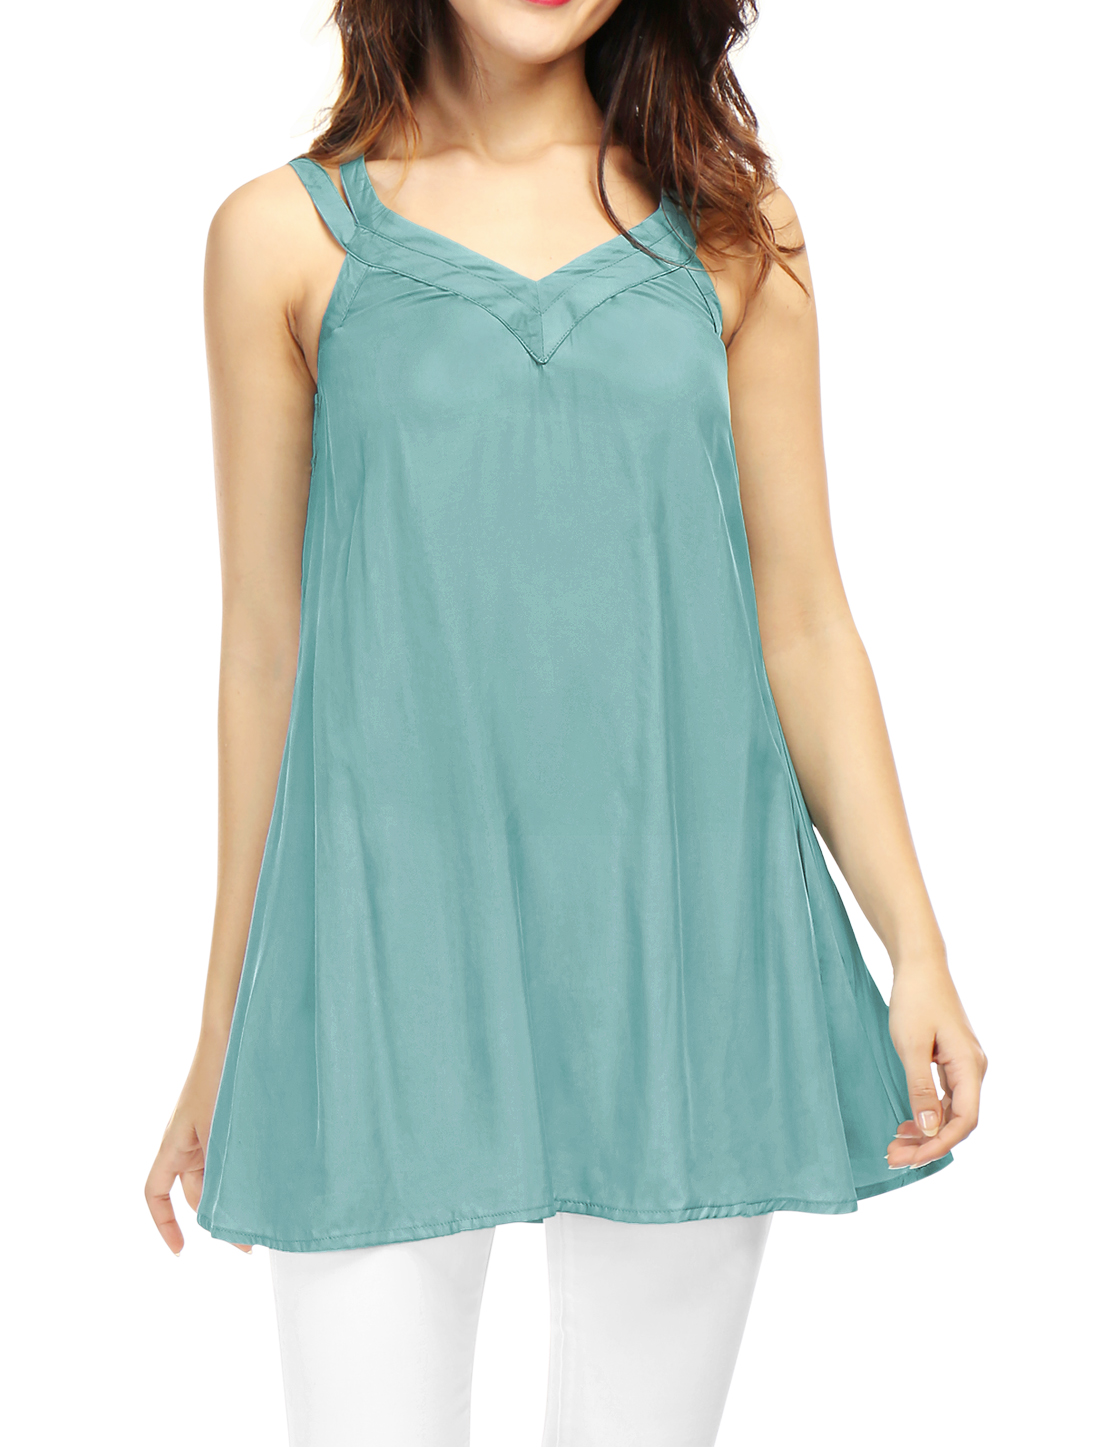 Women Sleeveless V Neckline Strappy Back Swing Tunic Top Green XL